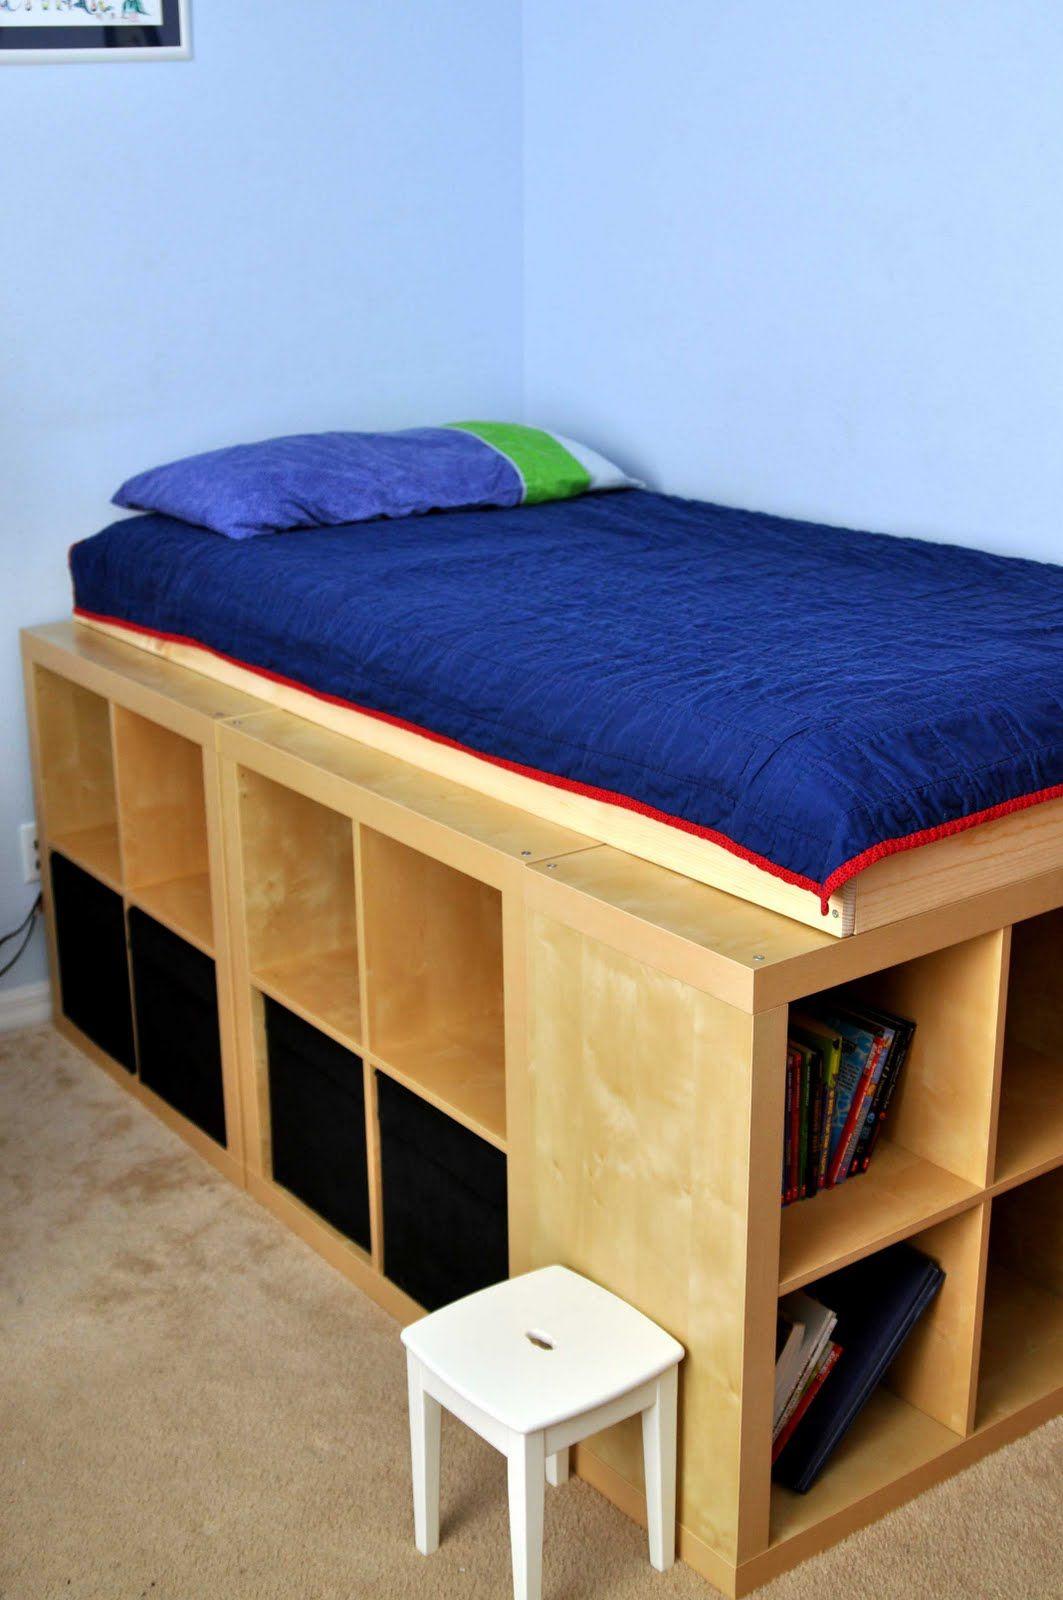 Expedit Storage Bed Ikea Bed Diy Storage Bed Storage Bed